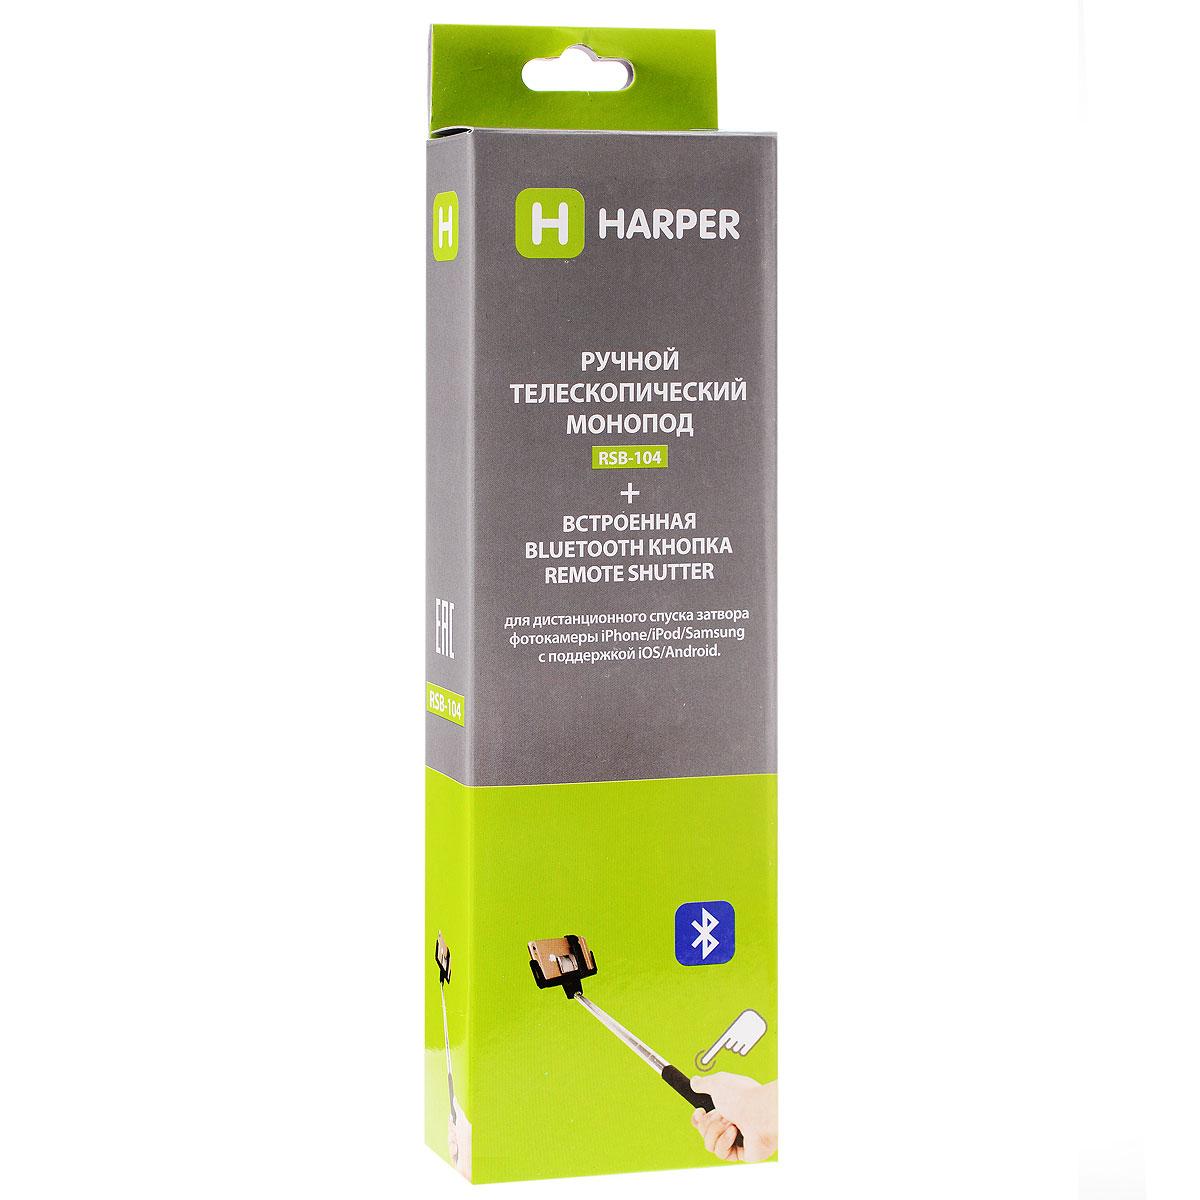 Harper RSB-104, Blue монопод для селфи